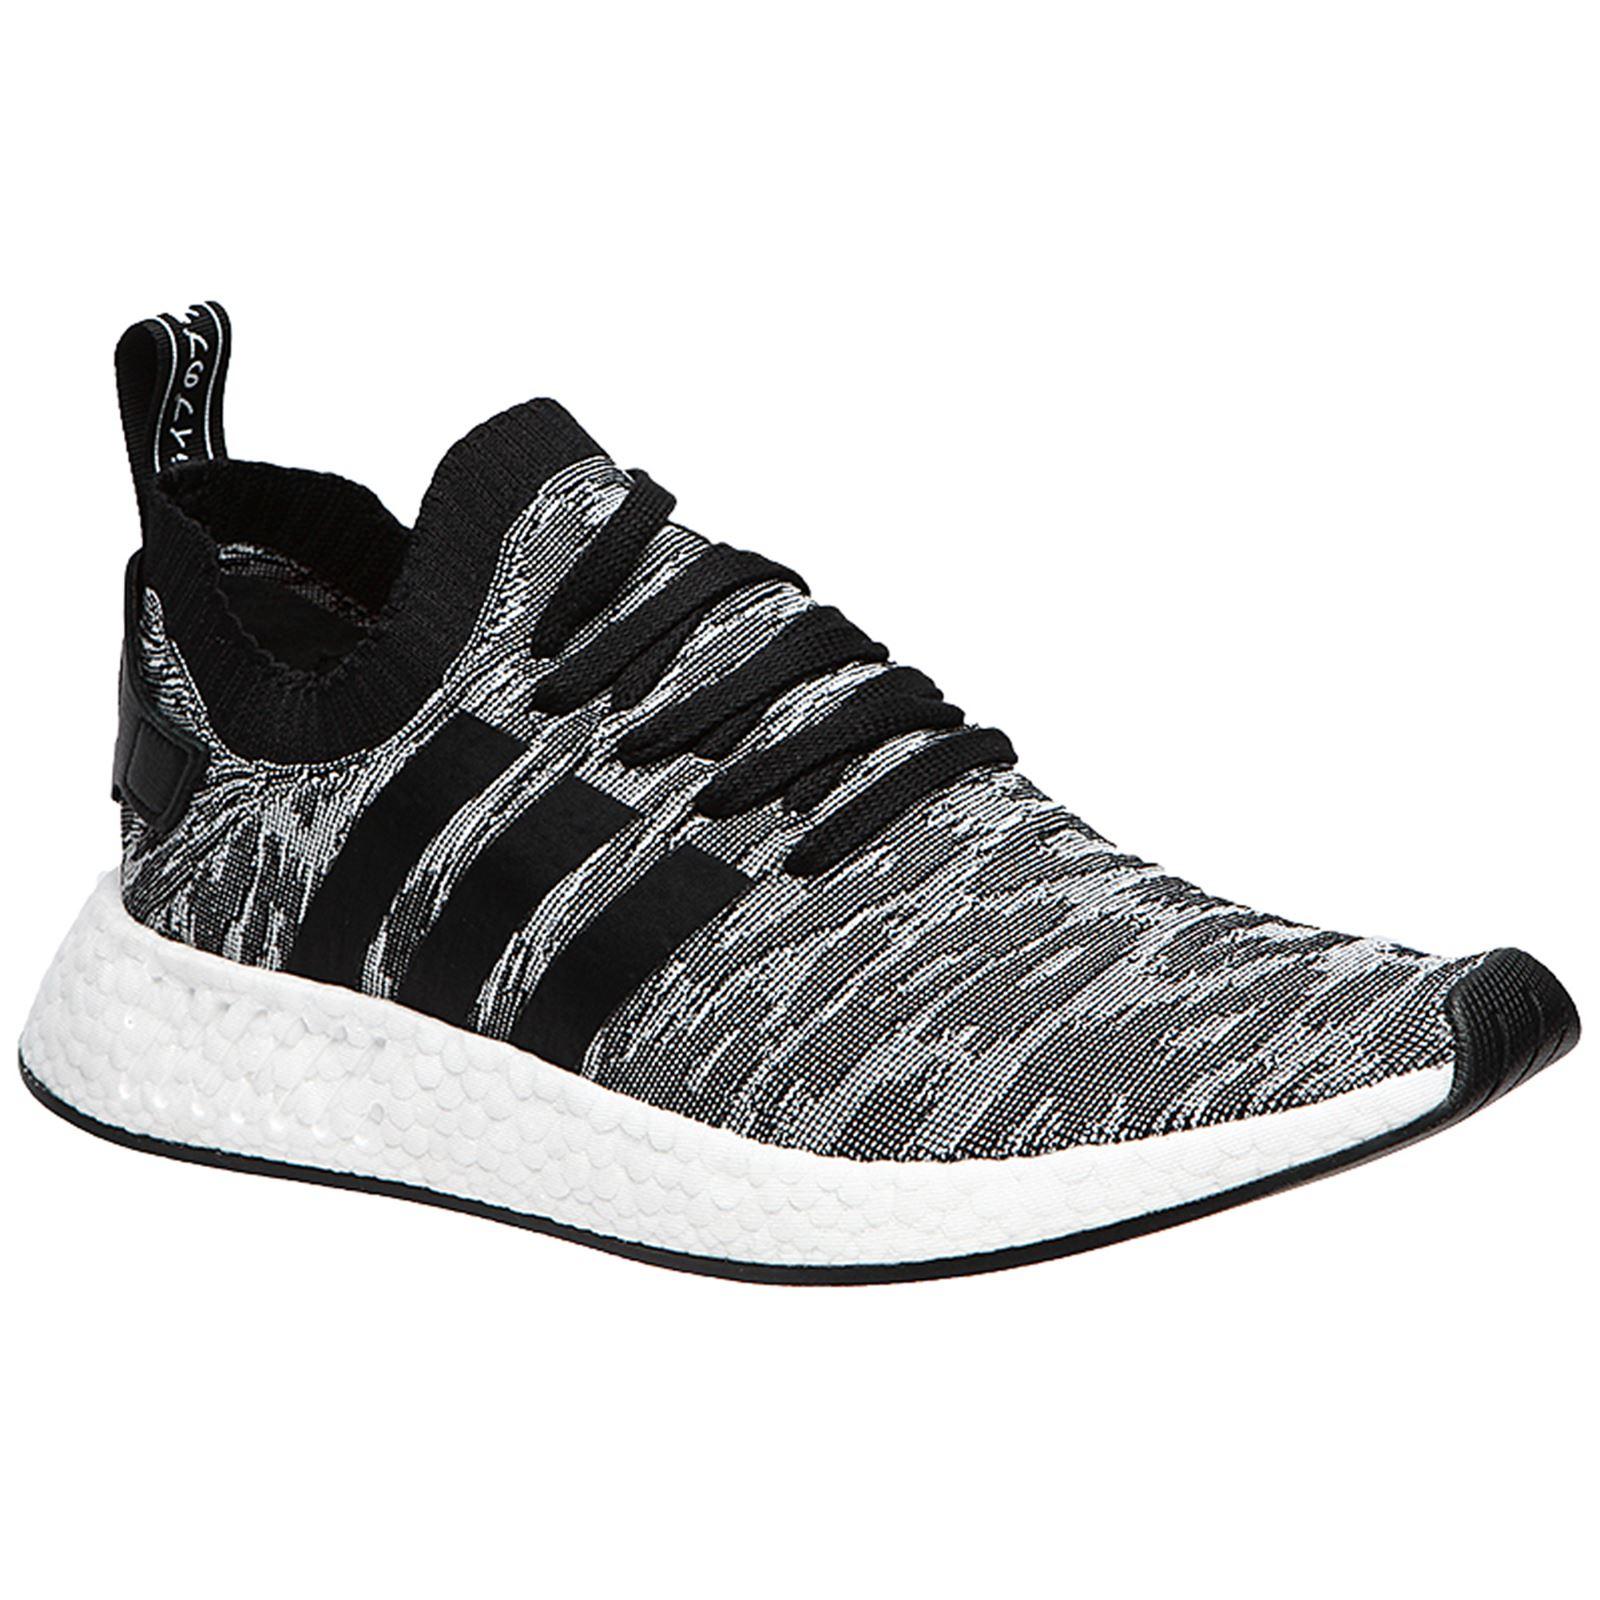 adidas rick owens mastodonte modèle ii cq1849 pro · adidas baskets